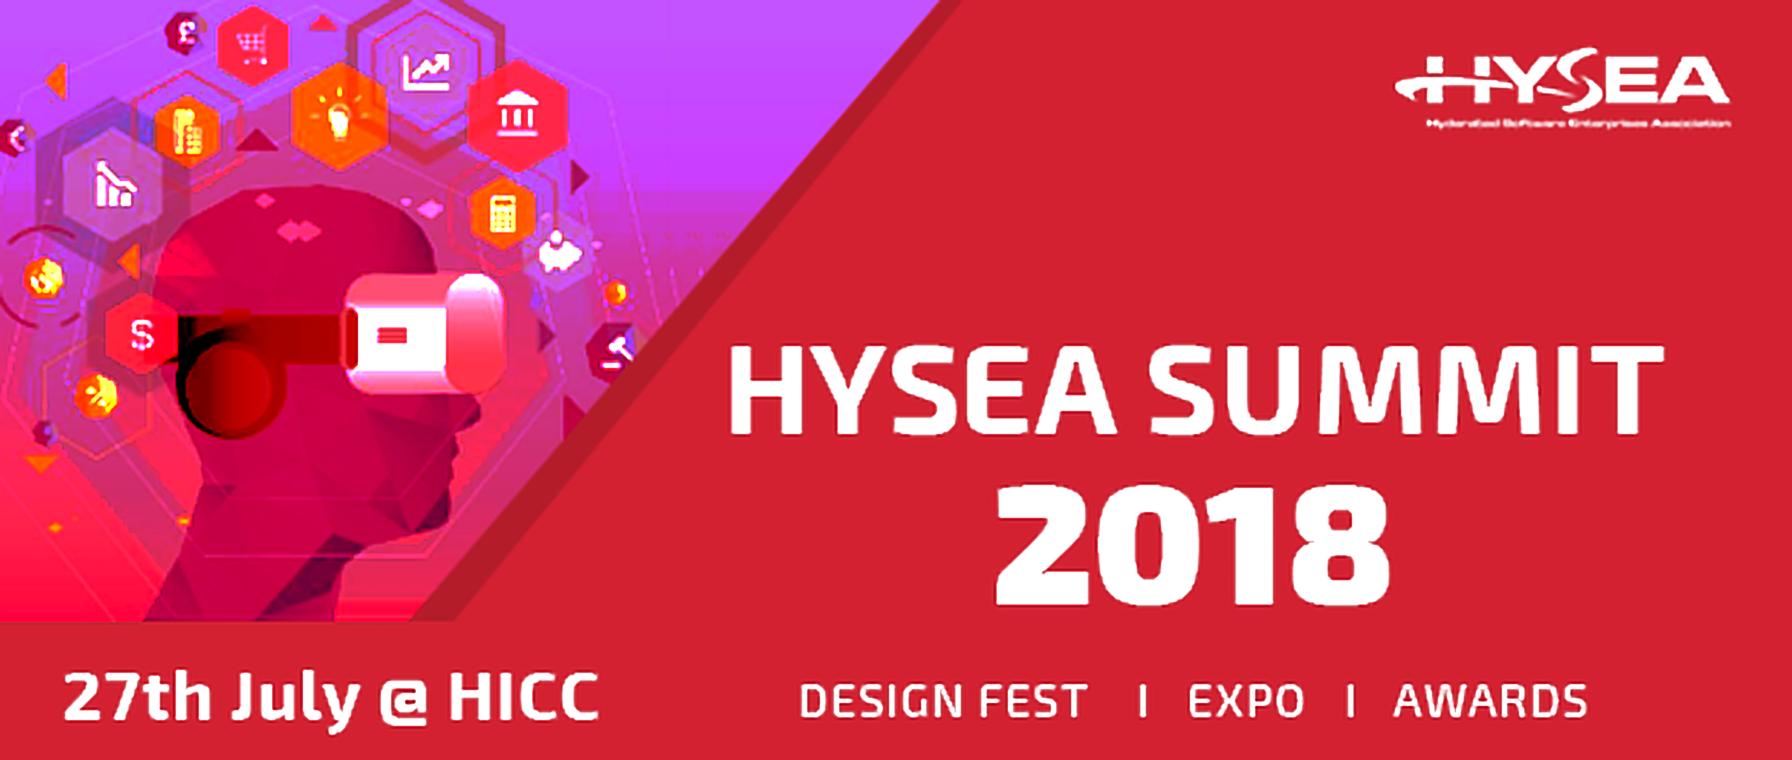 hysea-2018-v1